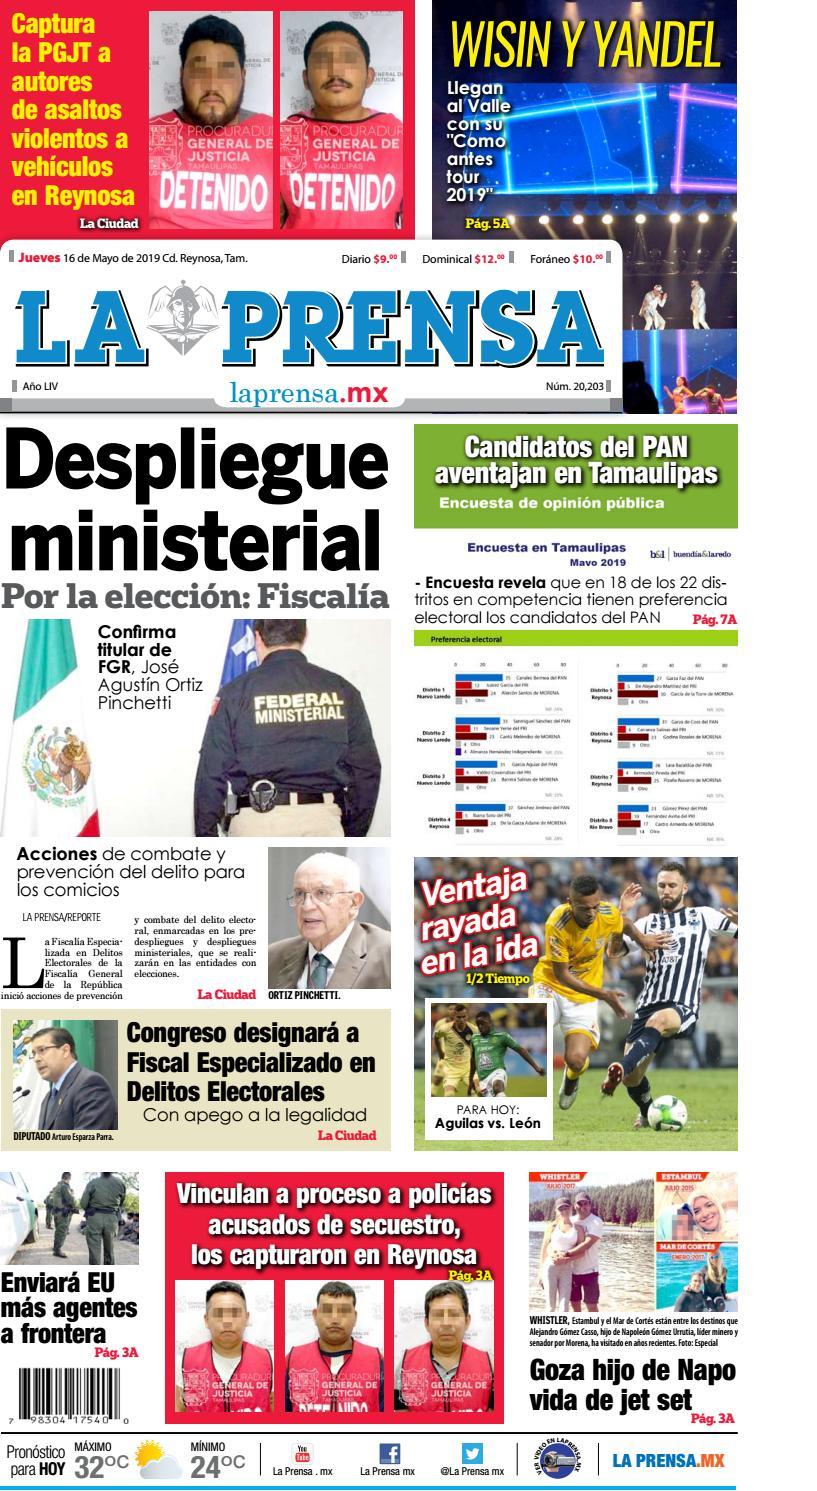 Reynosa La Prensa Issuu By Laprensa De RL3jqA54